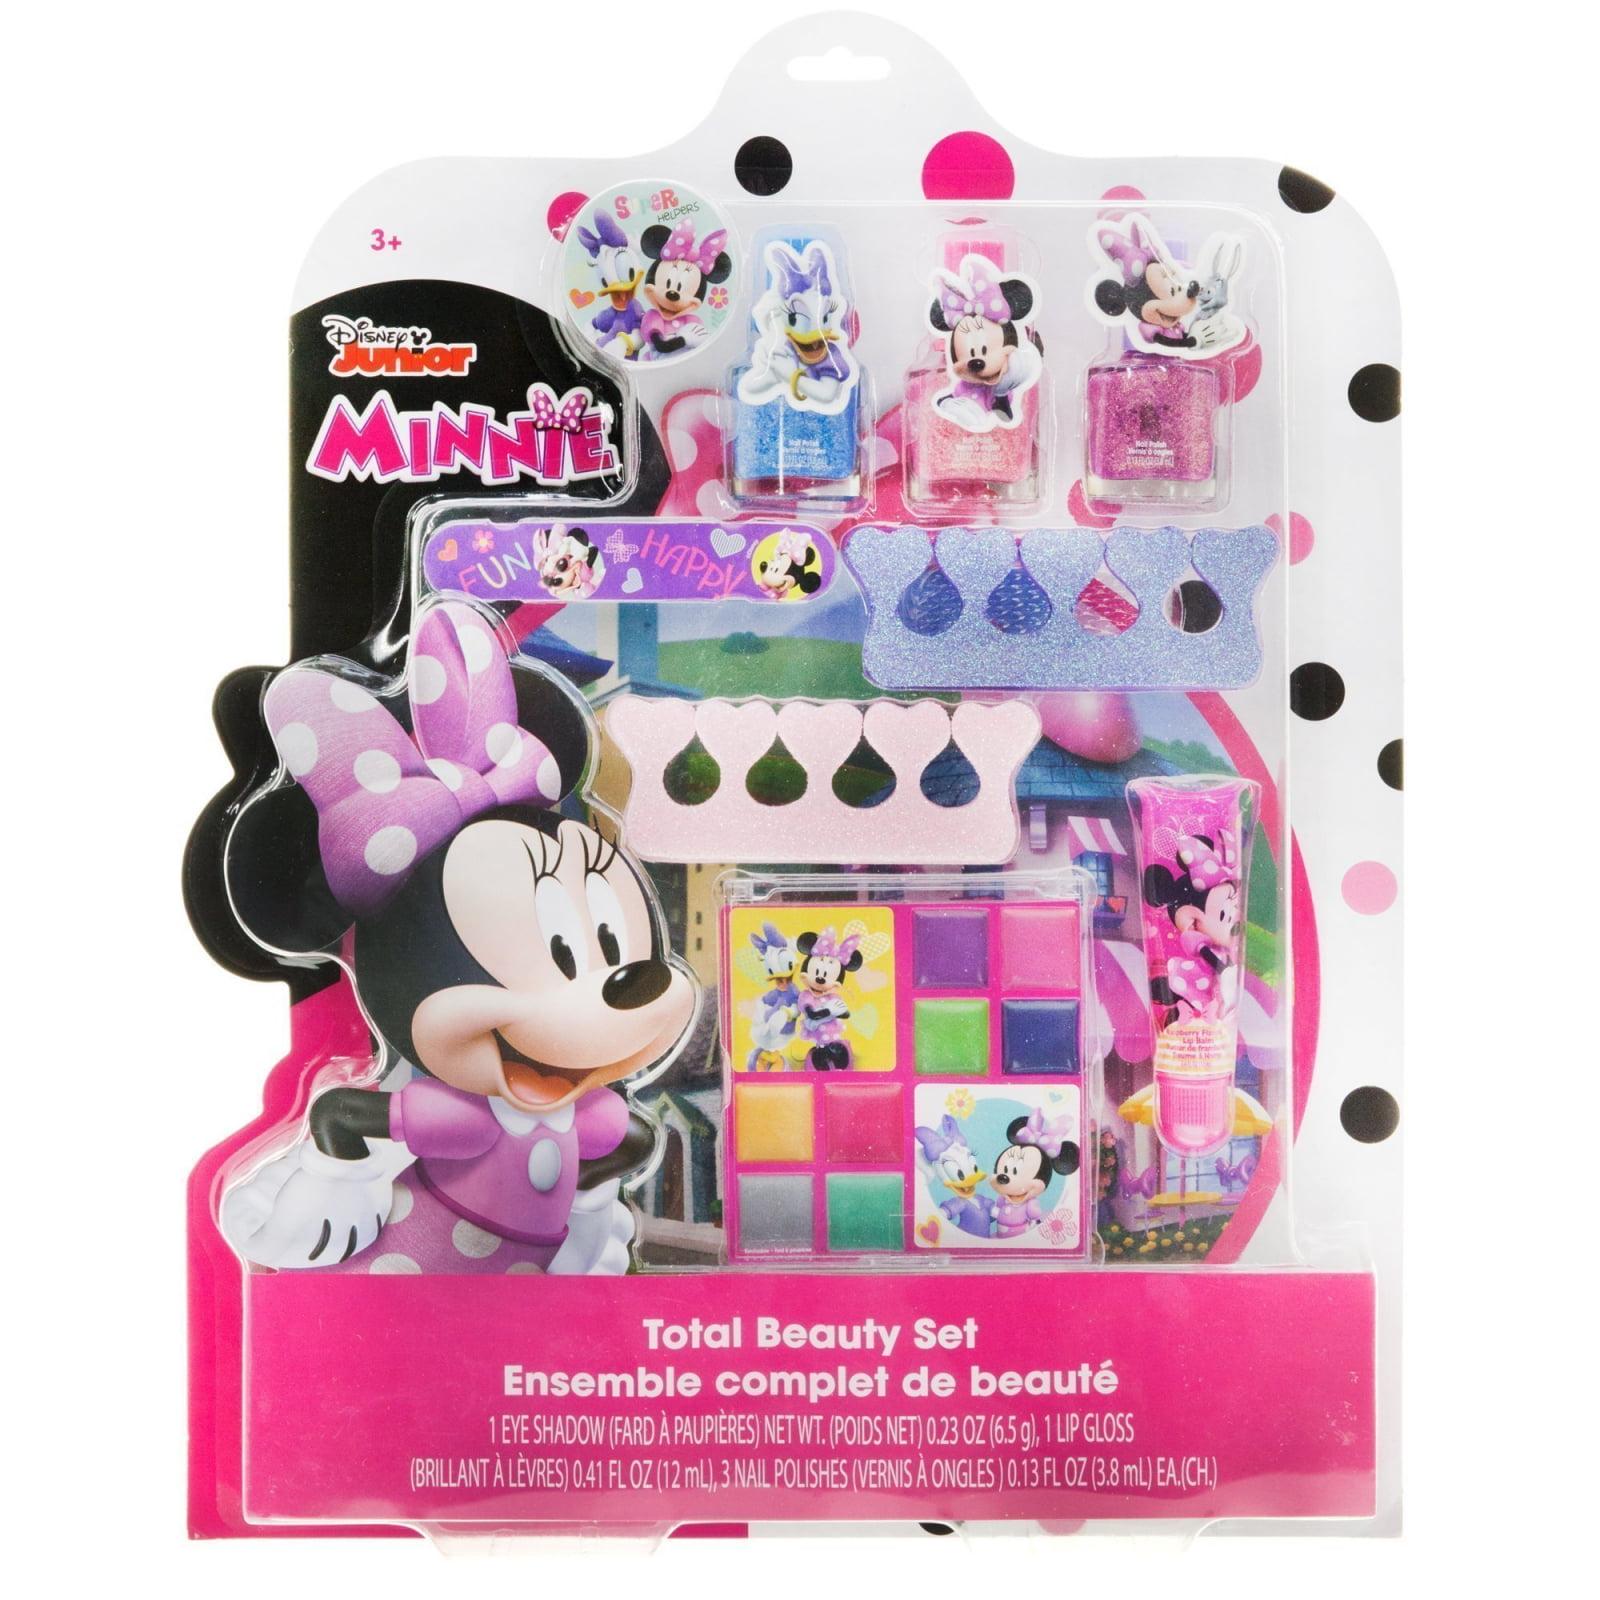 Disney Minnie Mouse Total Beauty Cosmetic Lip Gloss Eye Shadow Nail Polish Set